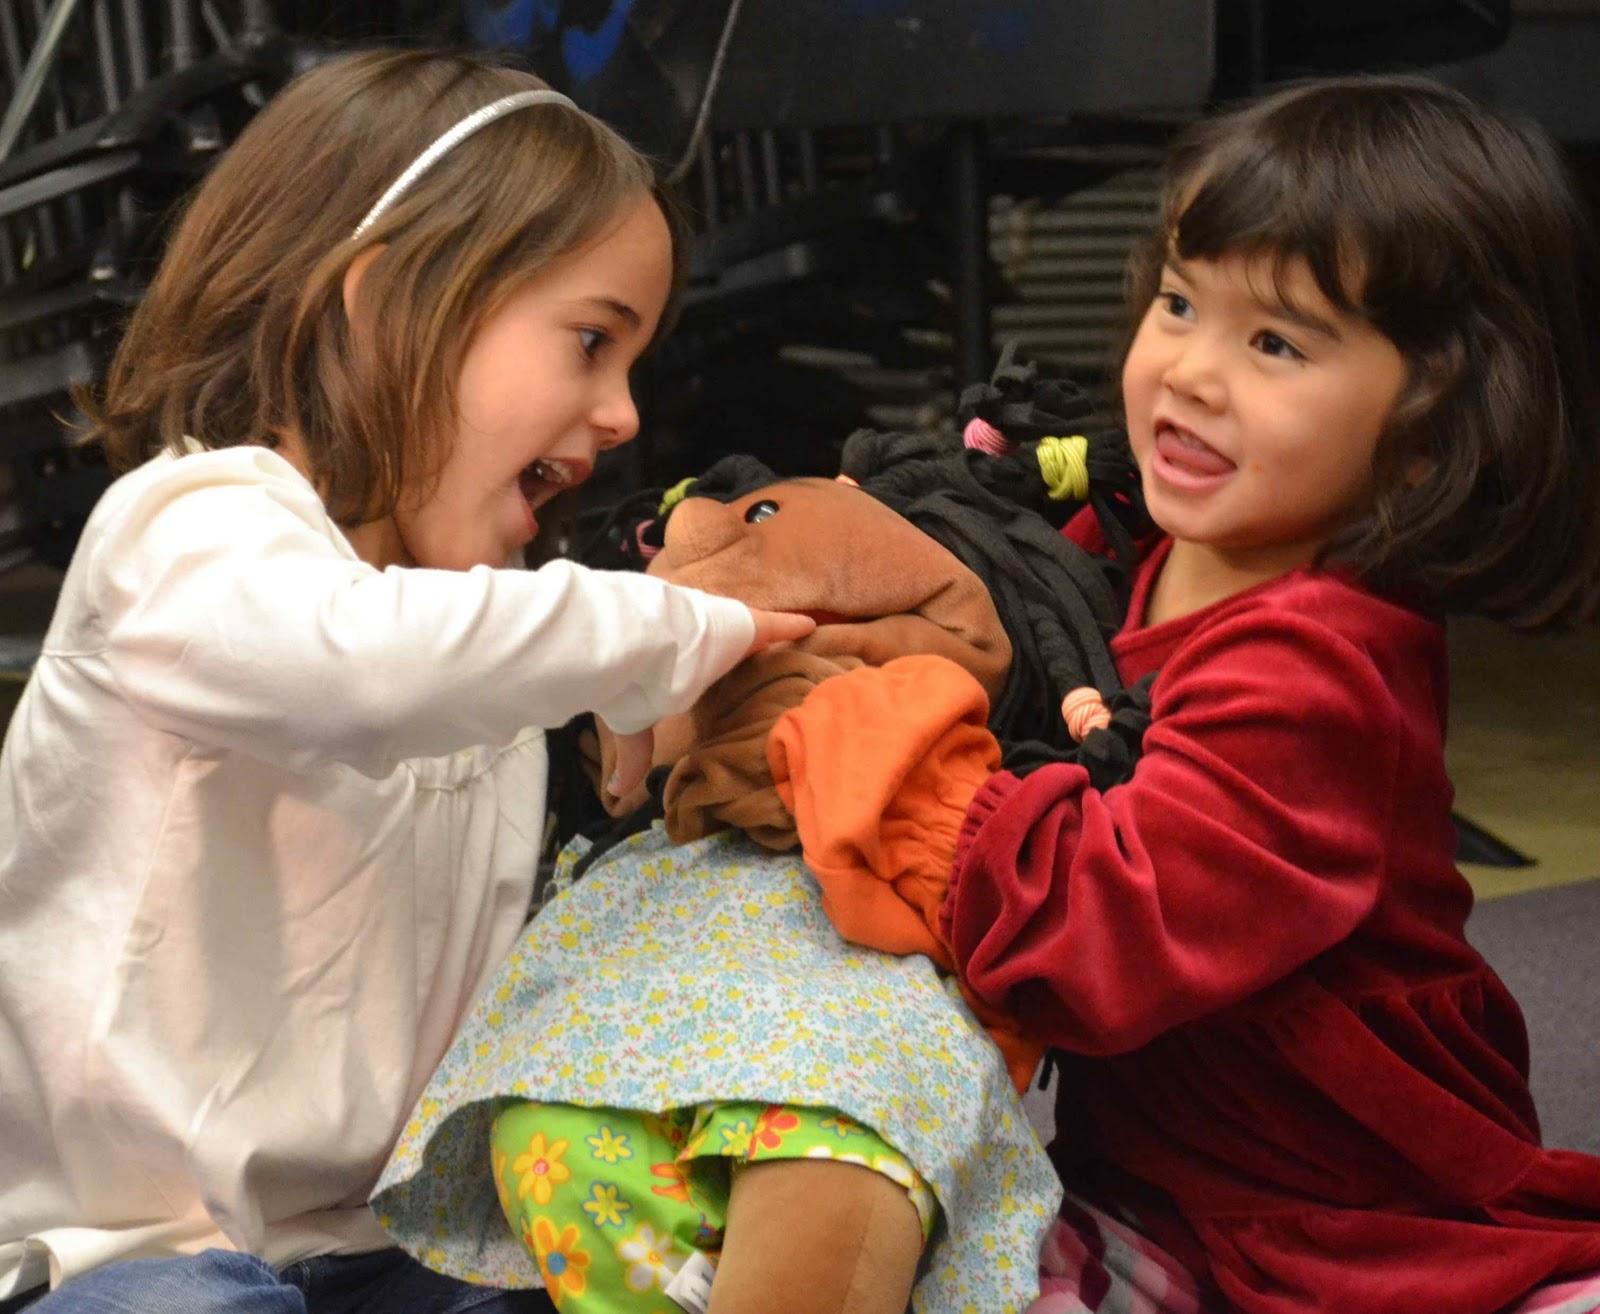 Integrated Play Groups Help Children >> Autismwonderland Through The Looking Glass Presents Heather Mccracken